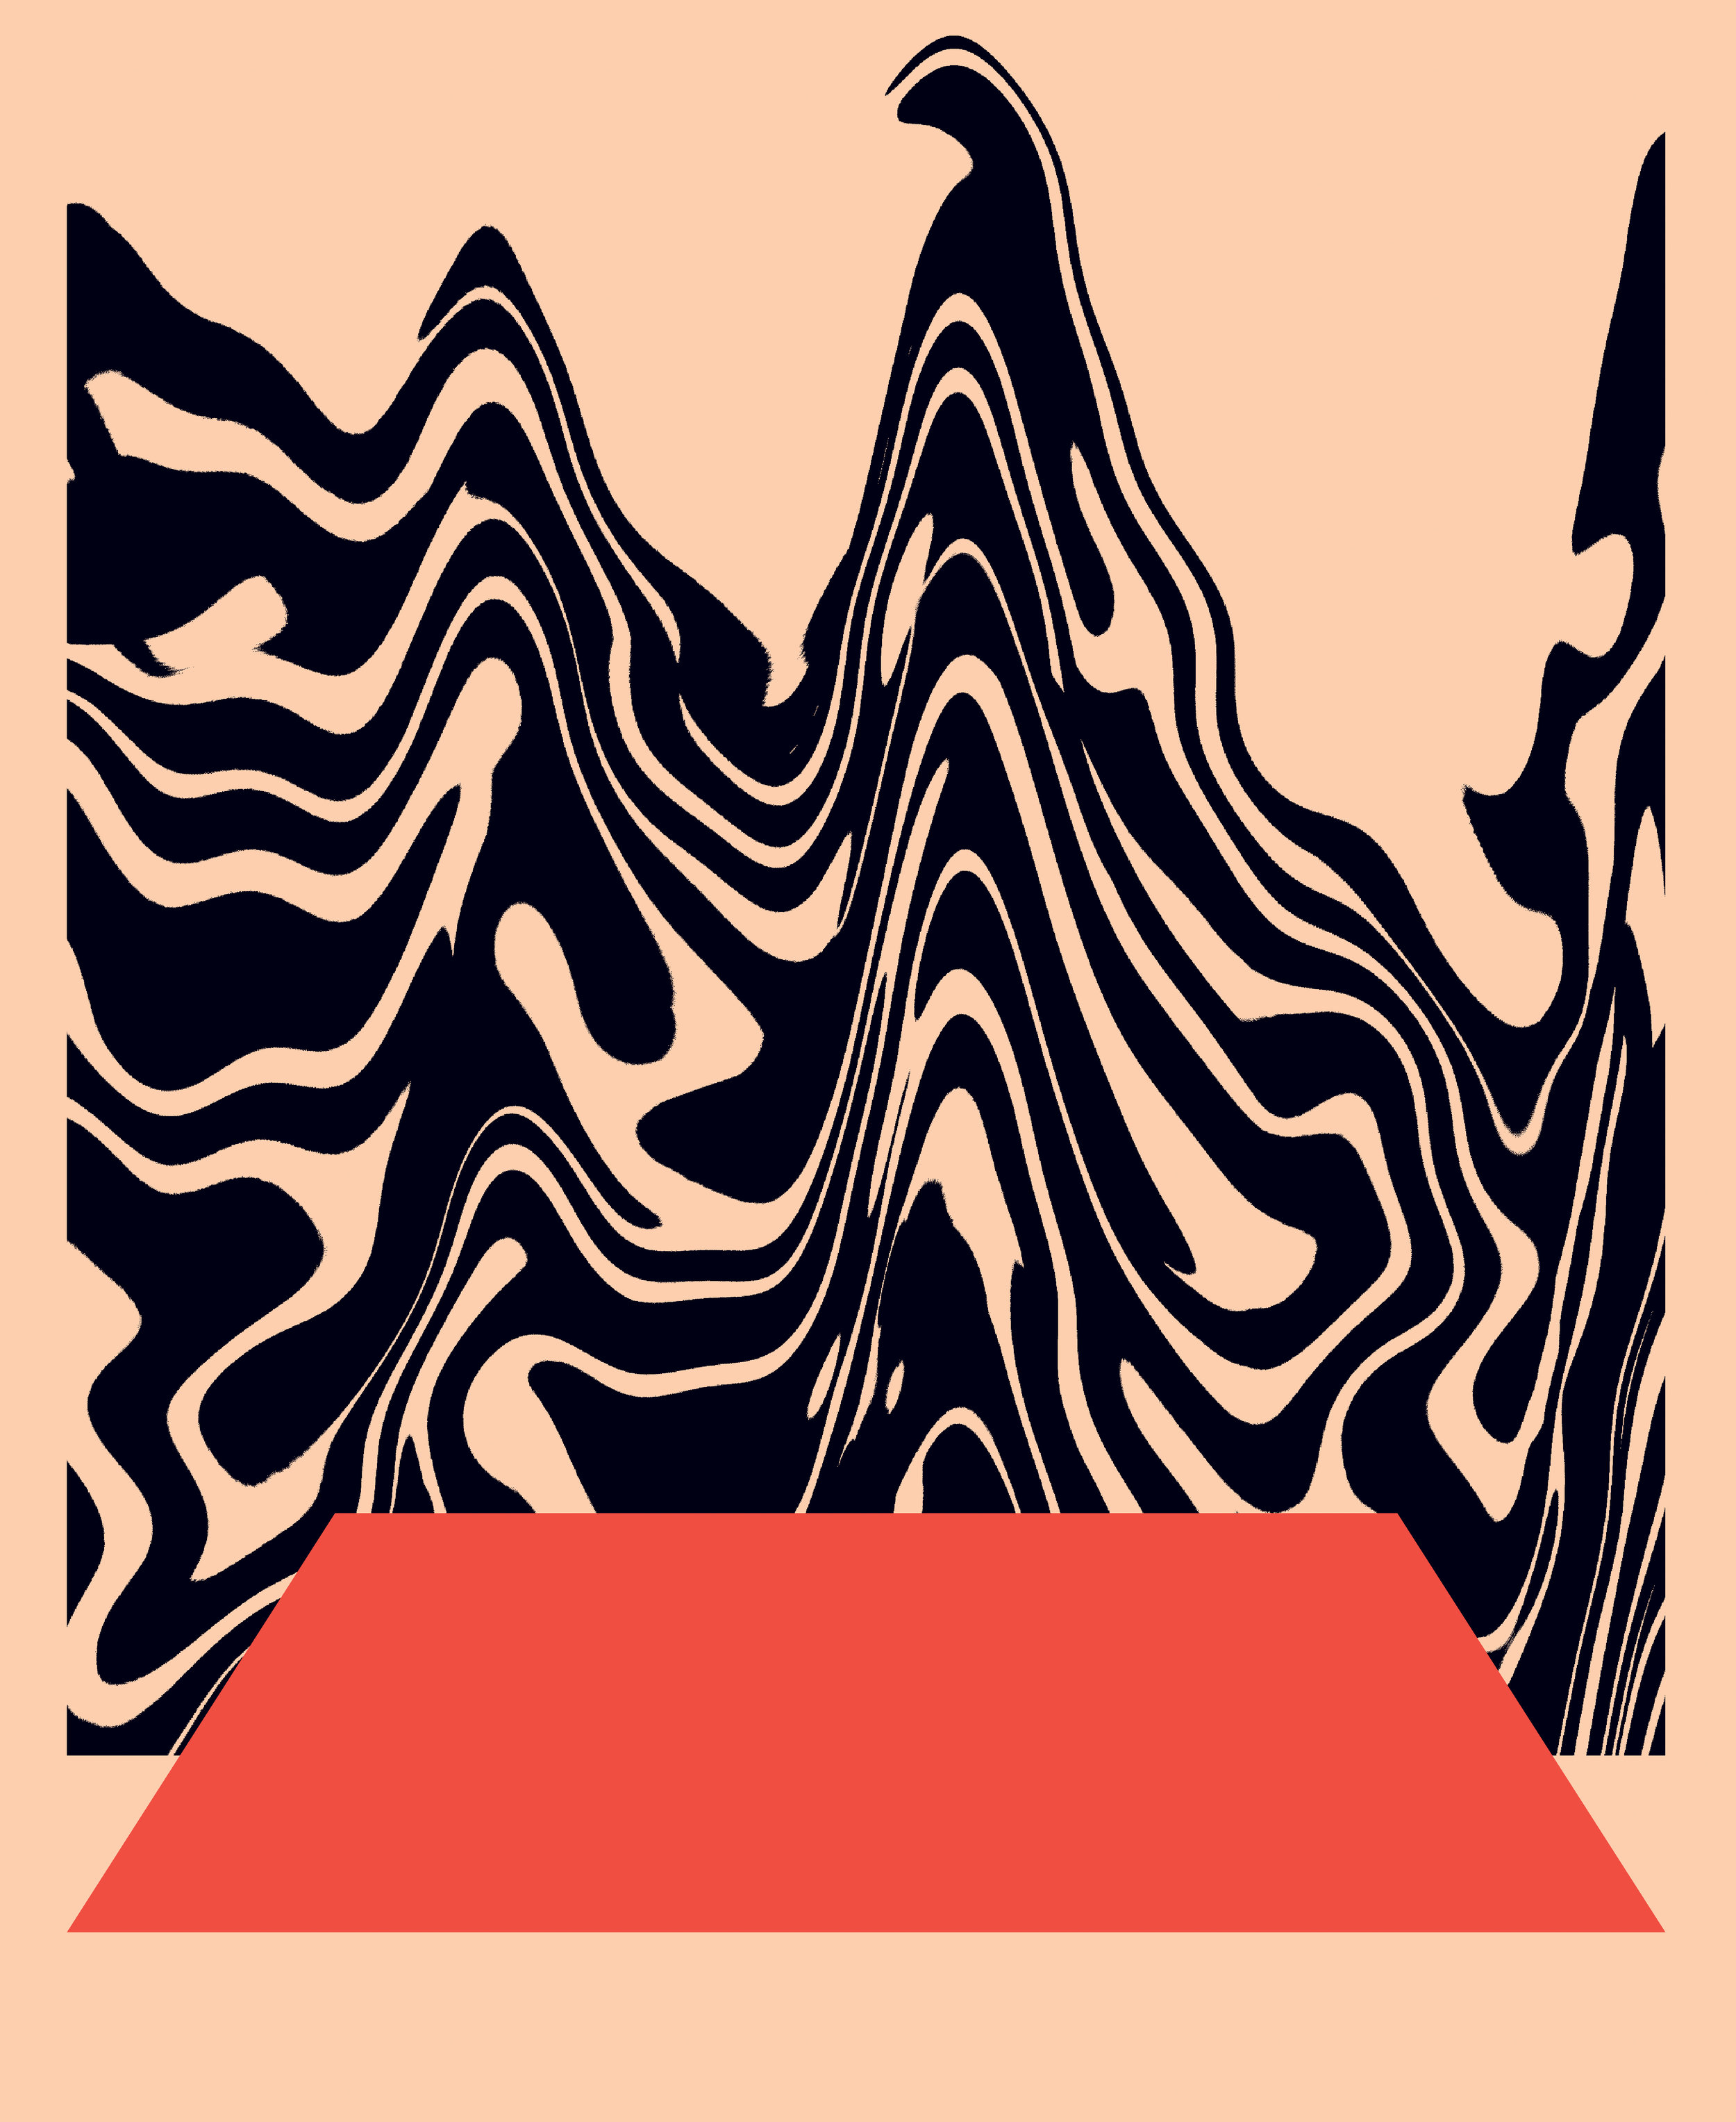 Matthew Korbel-Bowers, Summer Void.